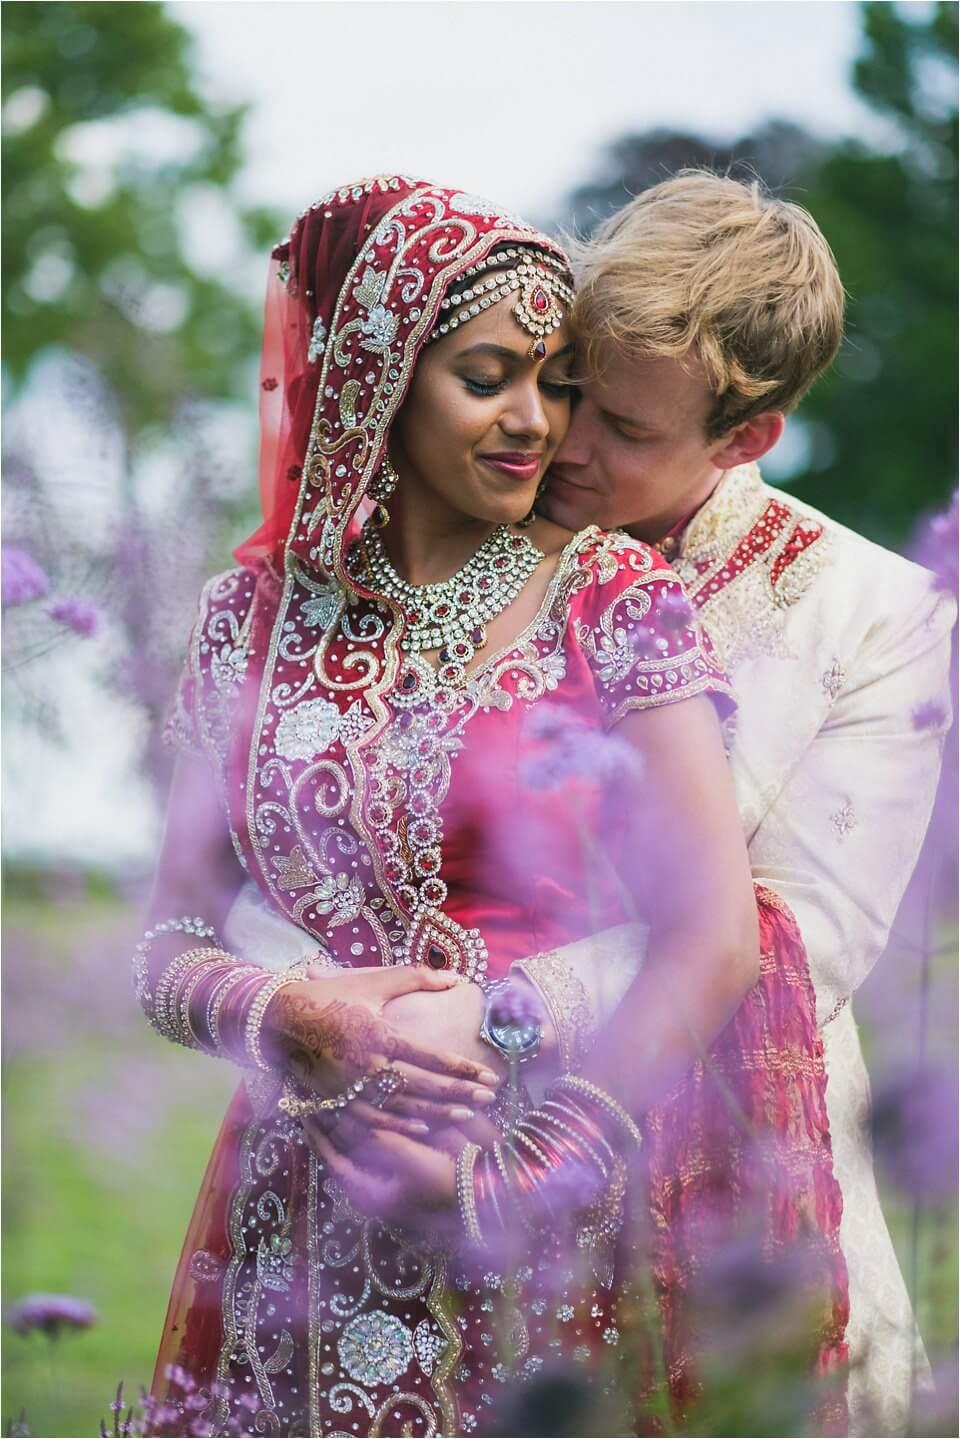 Kirtlington Park Wedding Photographer